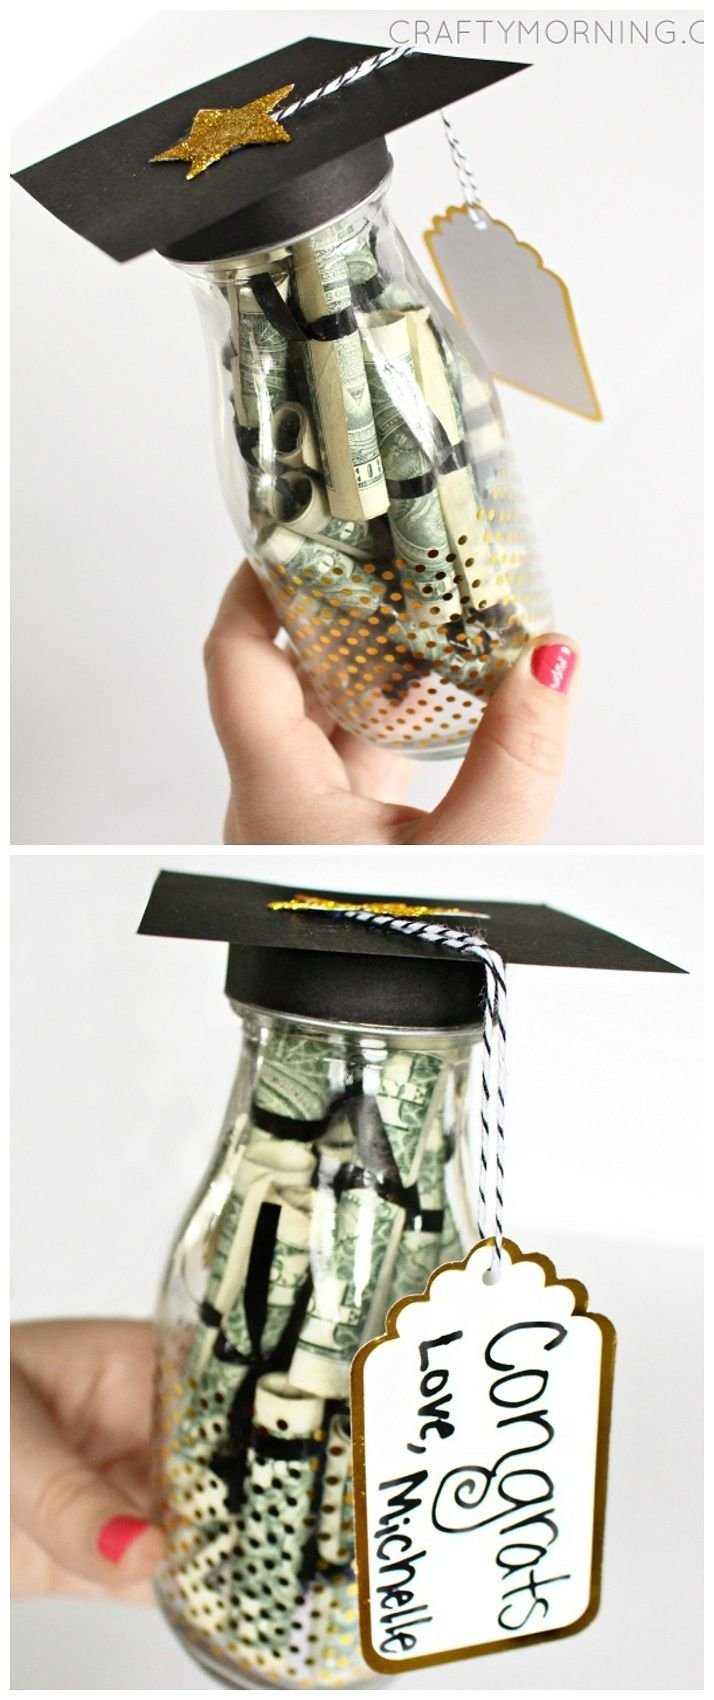 10 trendy graduation gift ideas for girlfriend